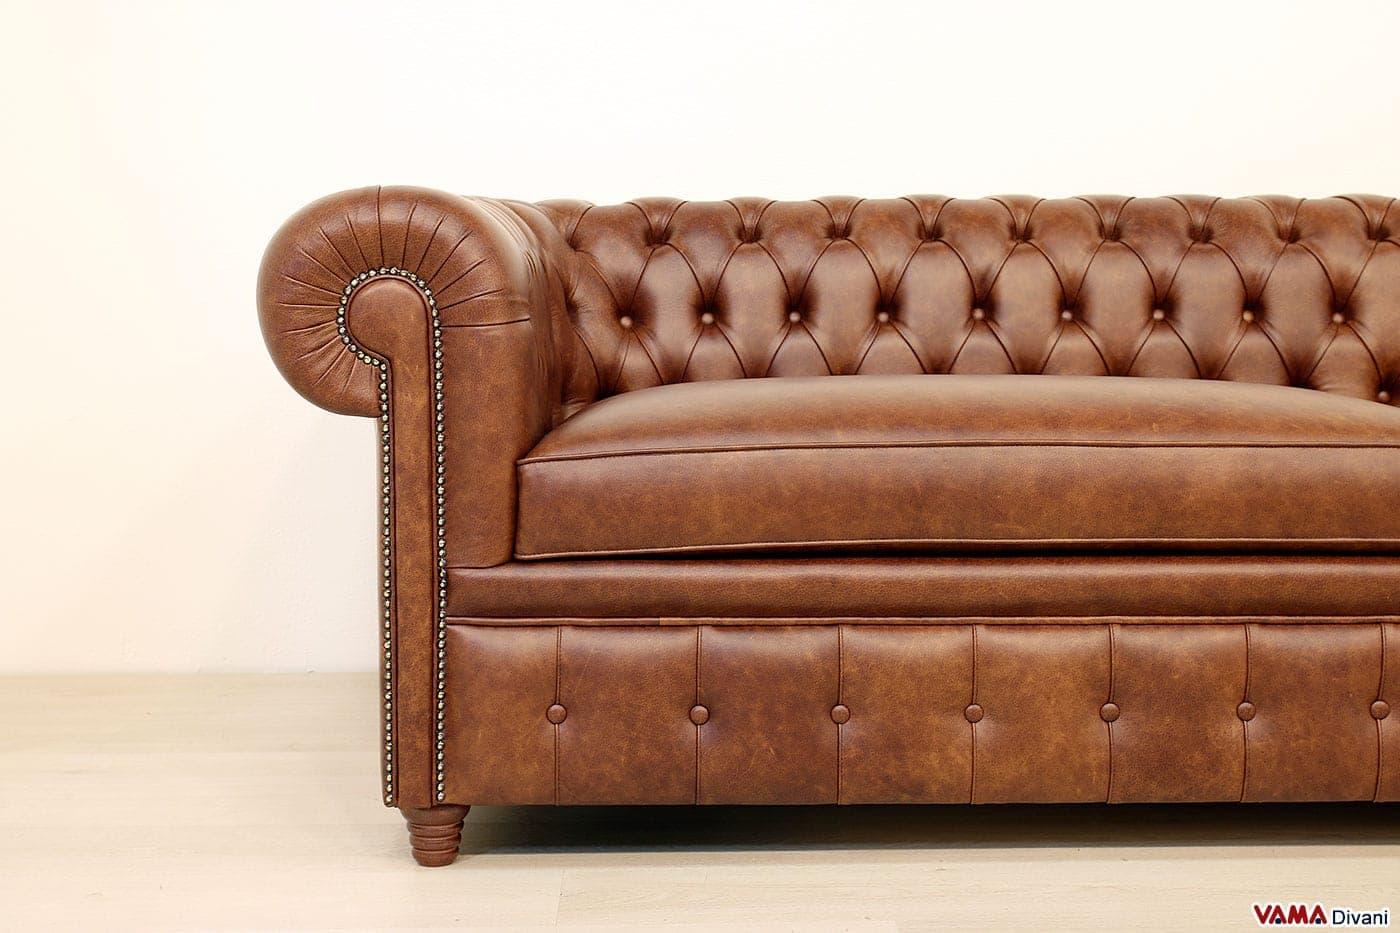 Divani Pelle Marrone Vintage : Divano in pelle vintage simple abile divano chester rosso vintage